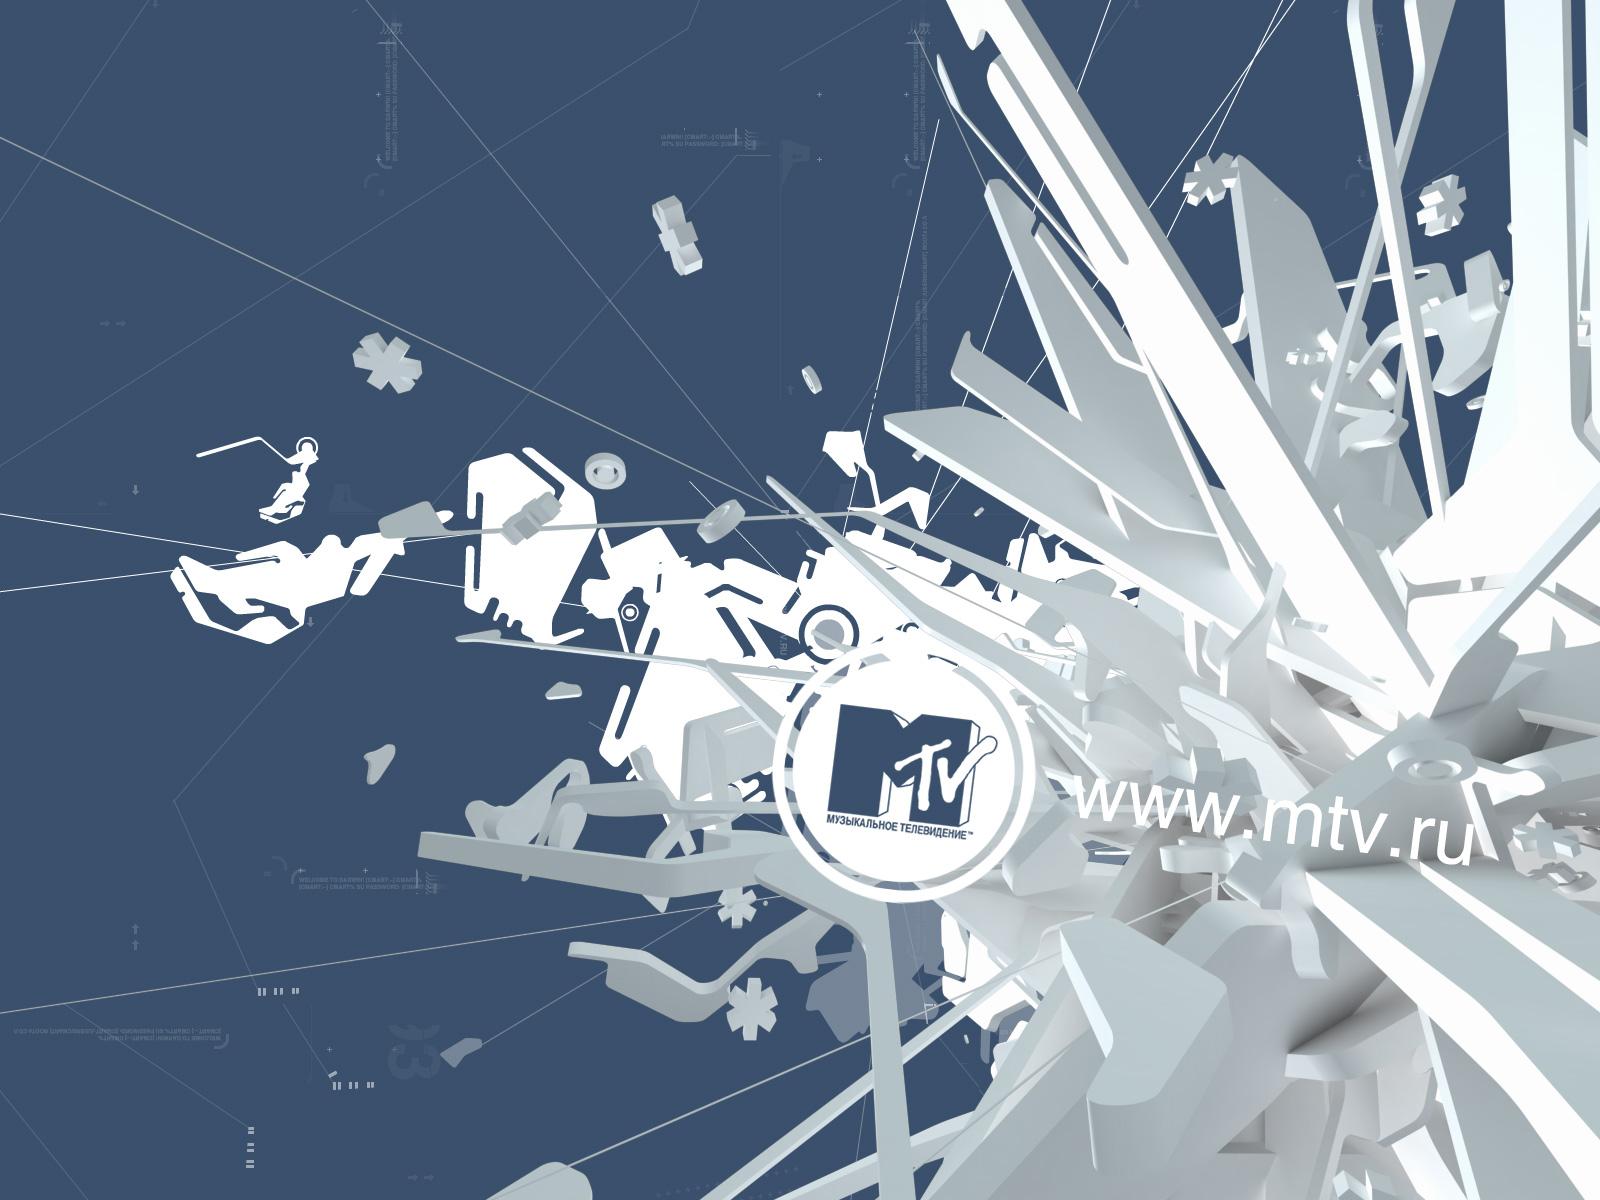 Mtv Desktop Wallpaper Collection